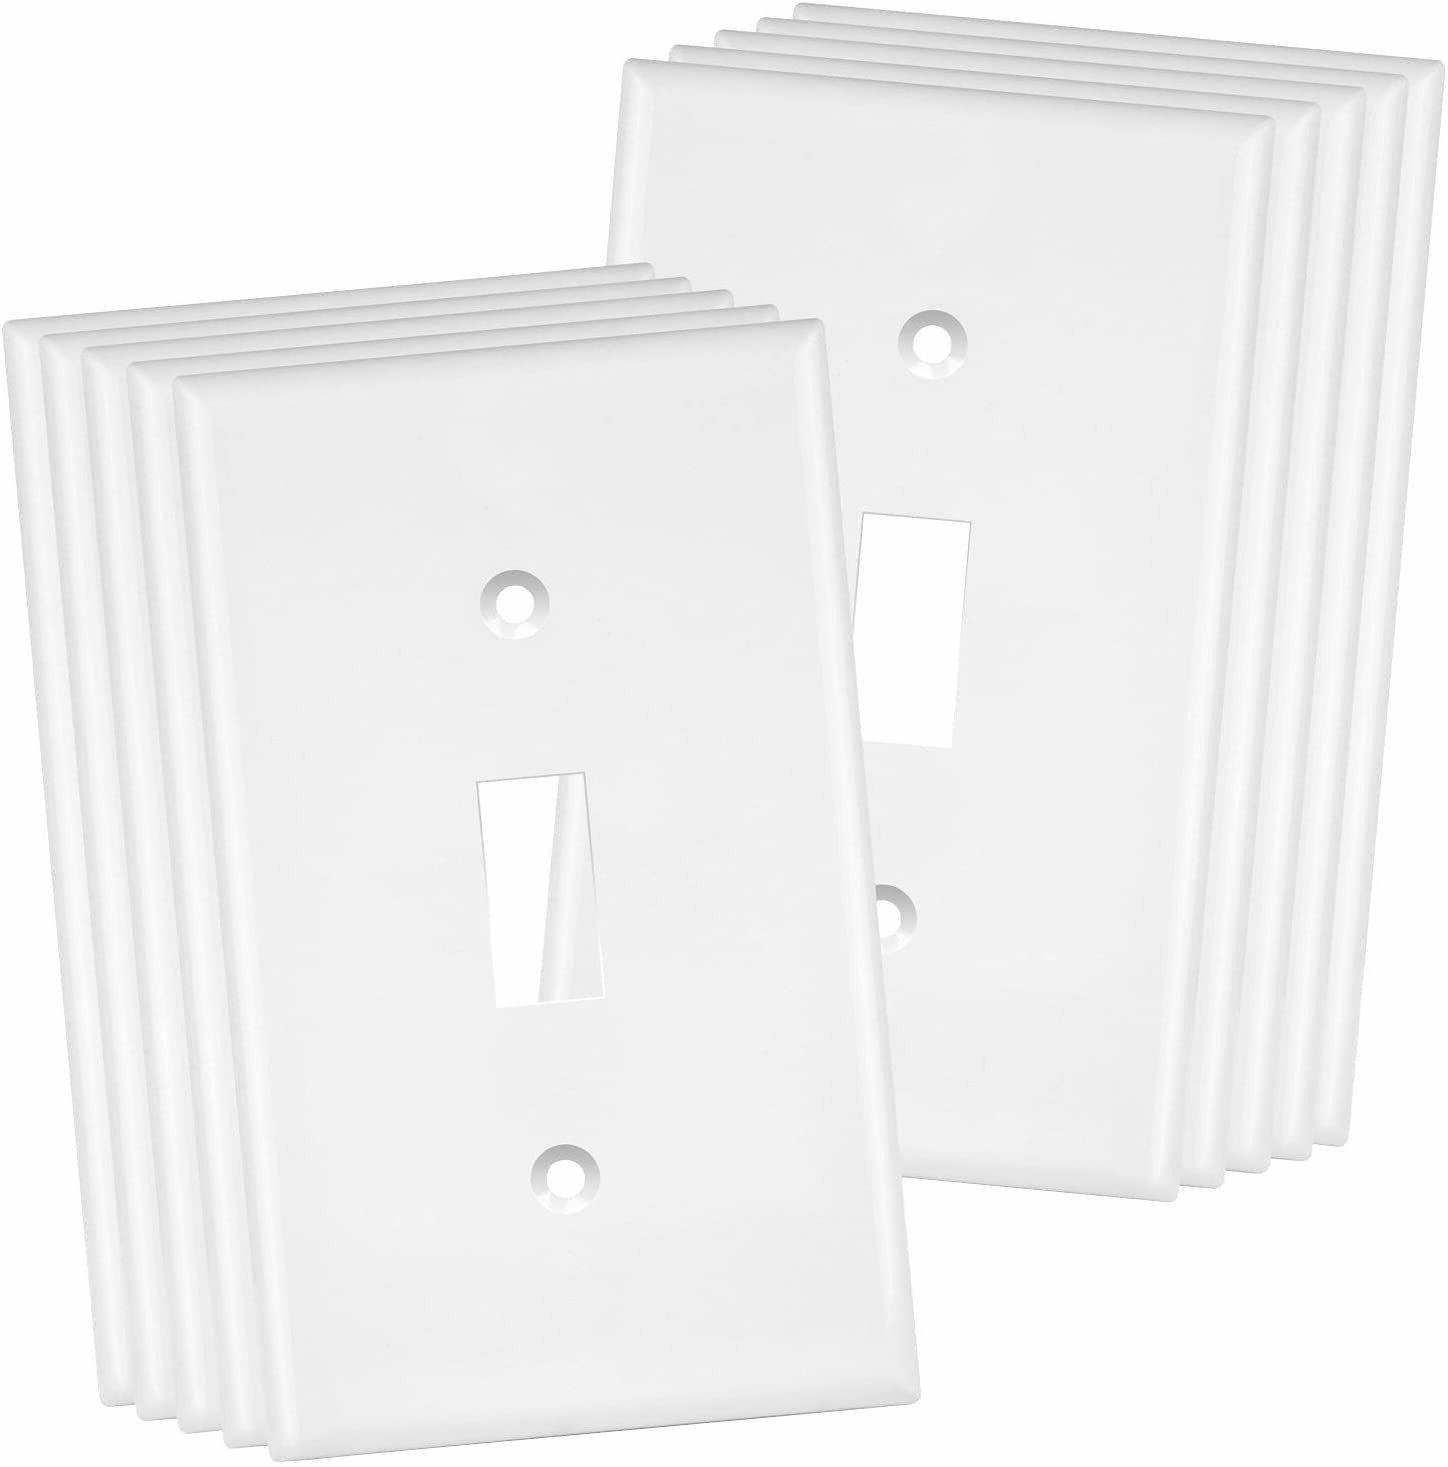 toggle light switch wall plate size 1